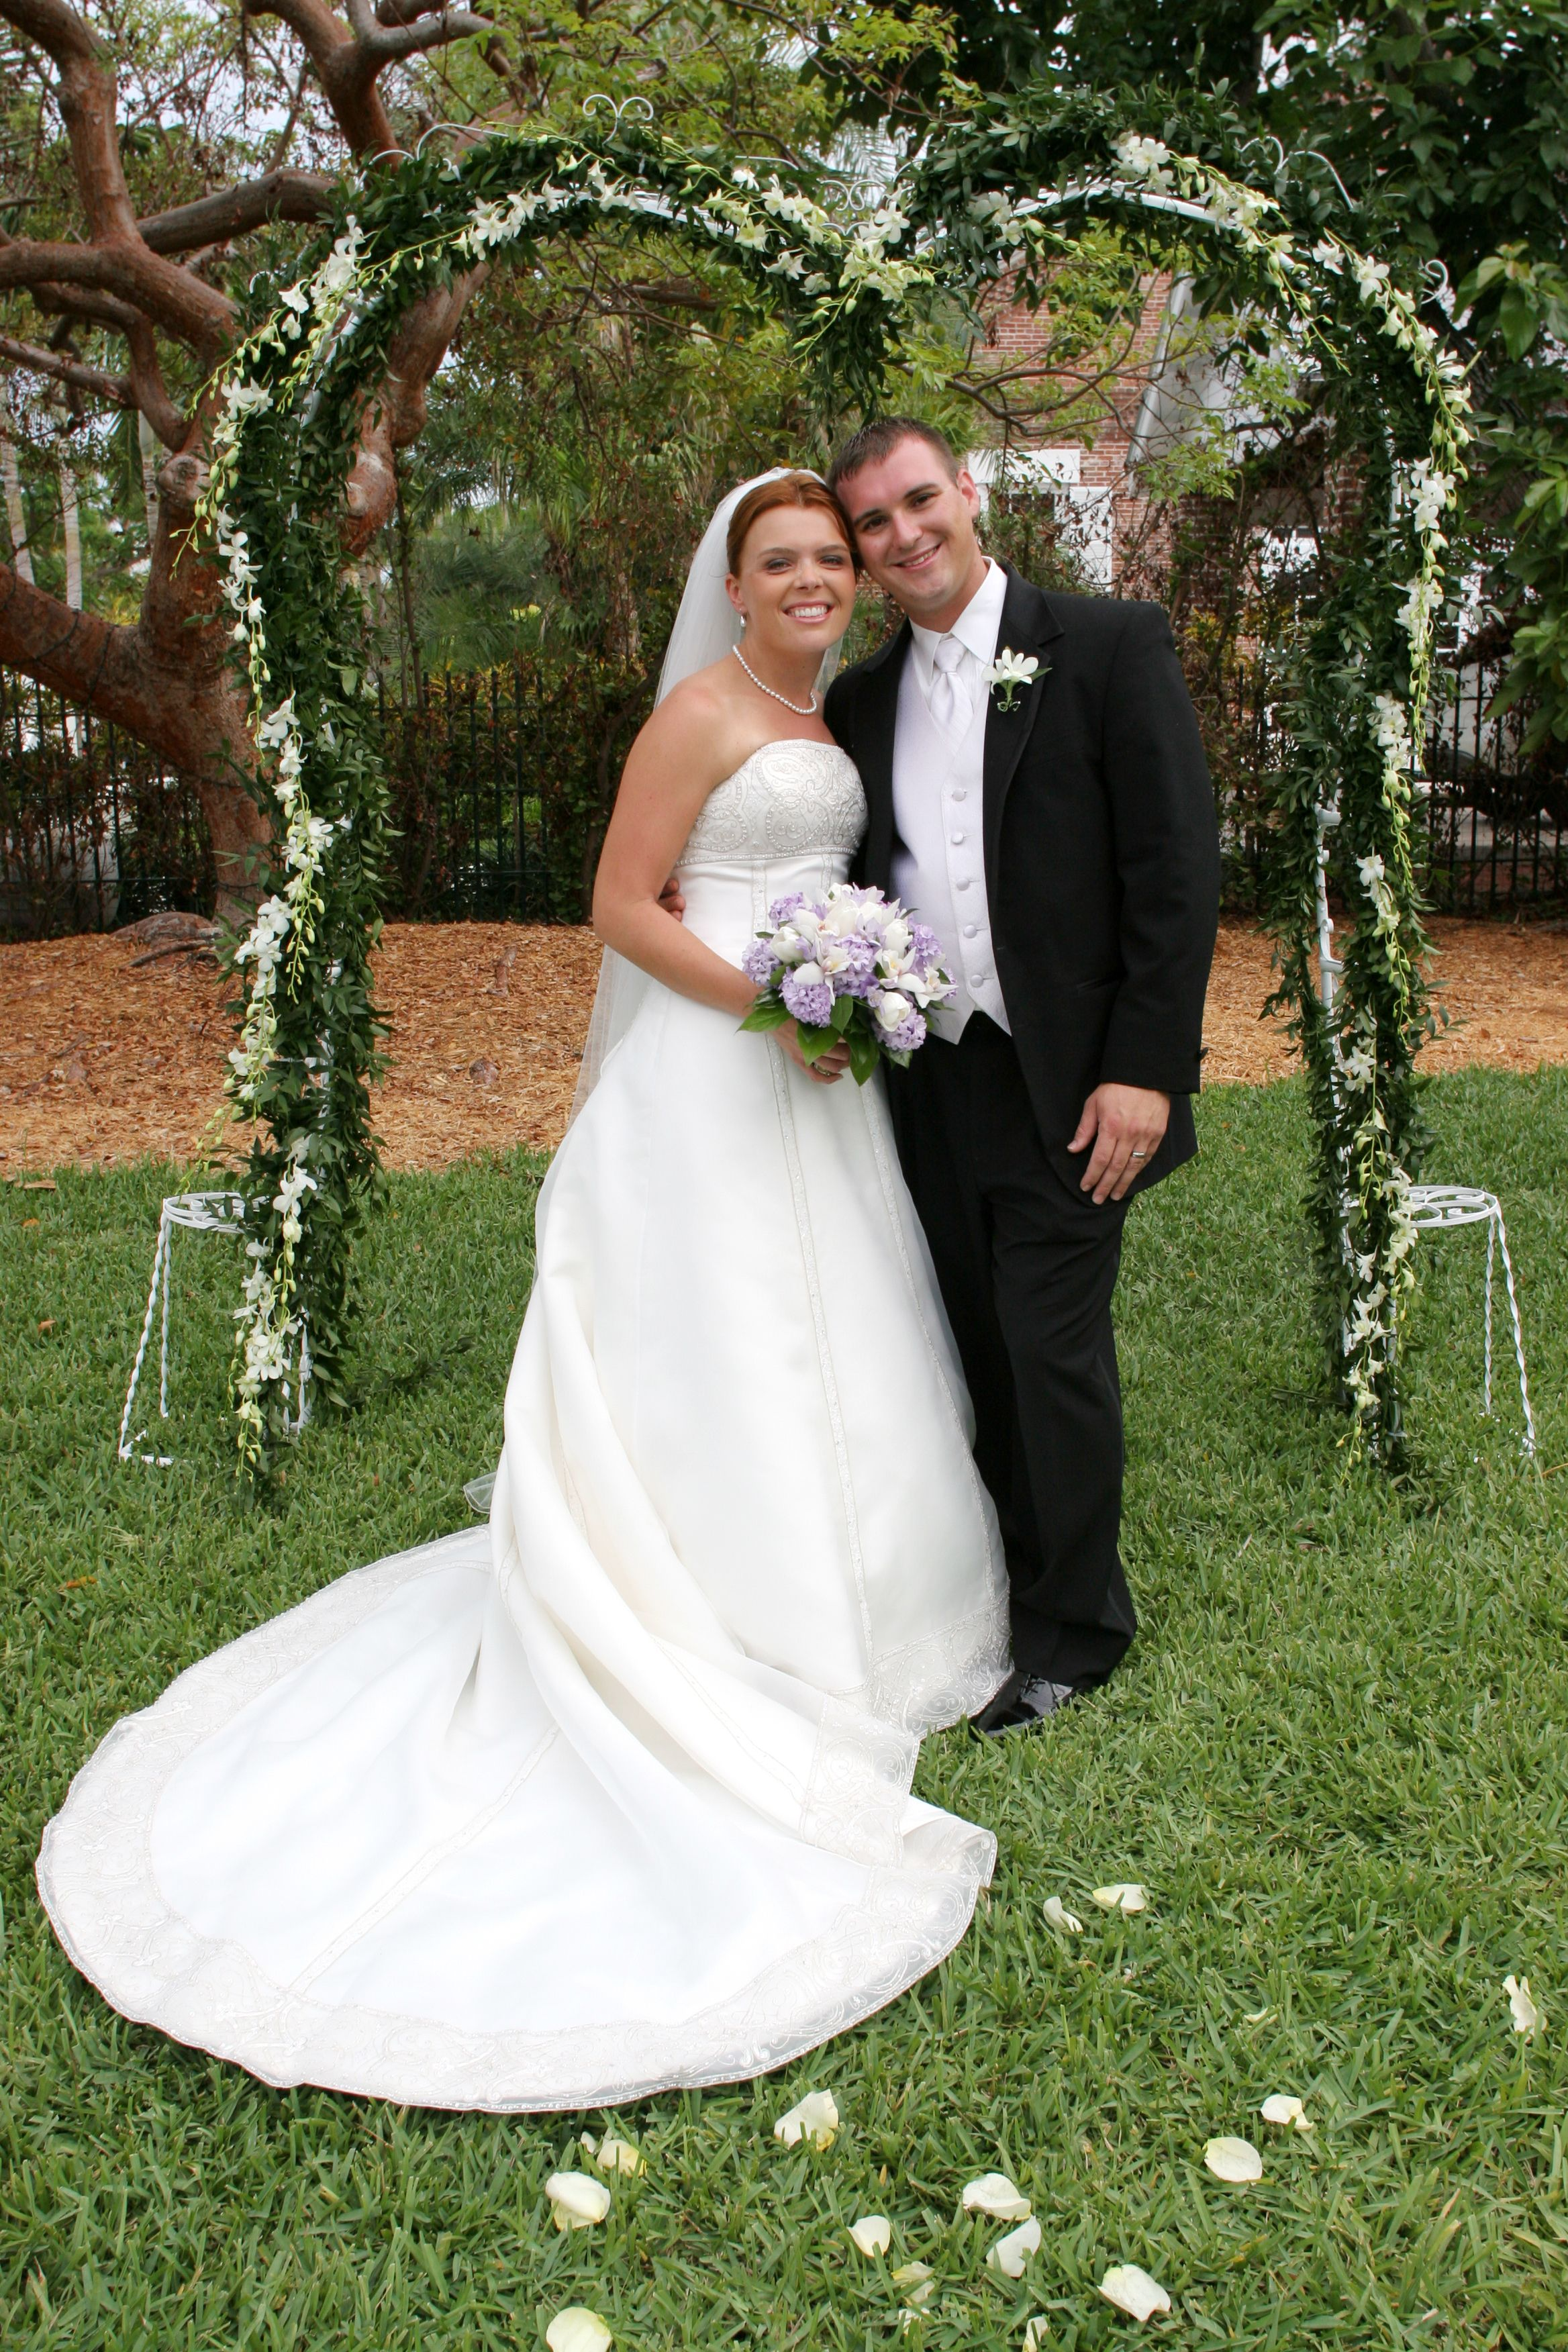 wedding photography poses wedding pose